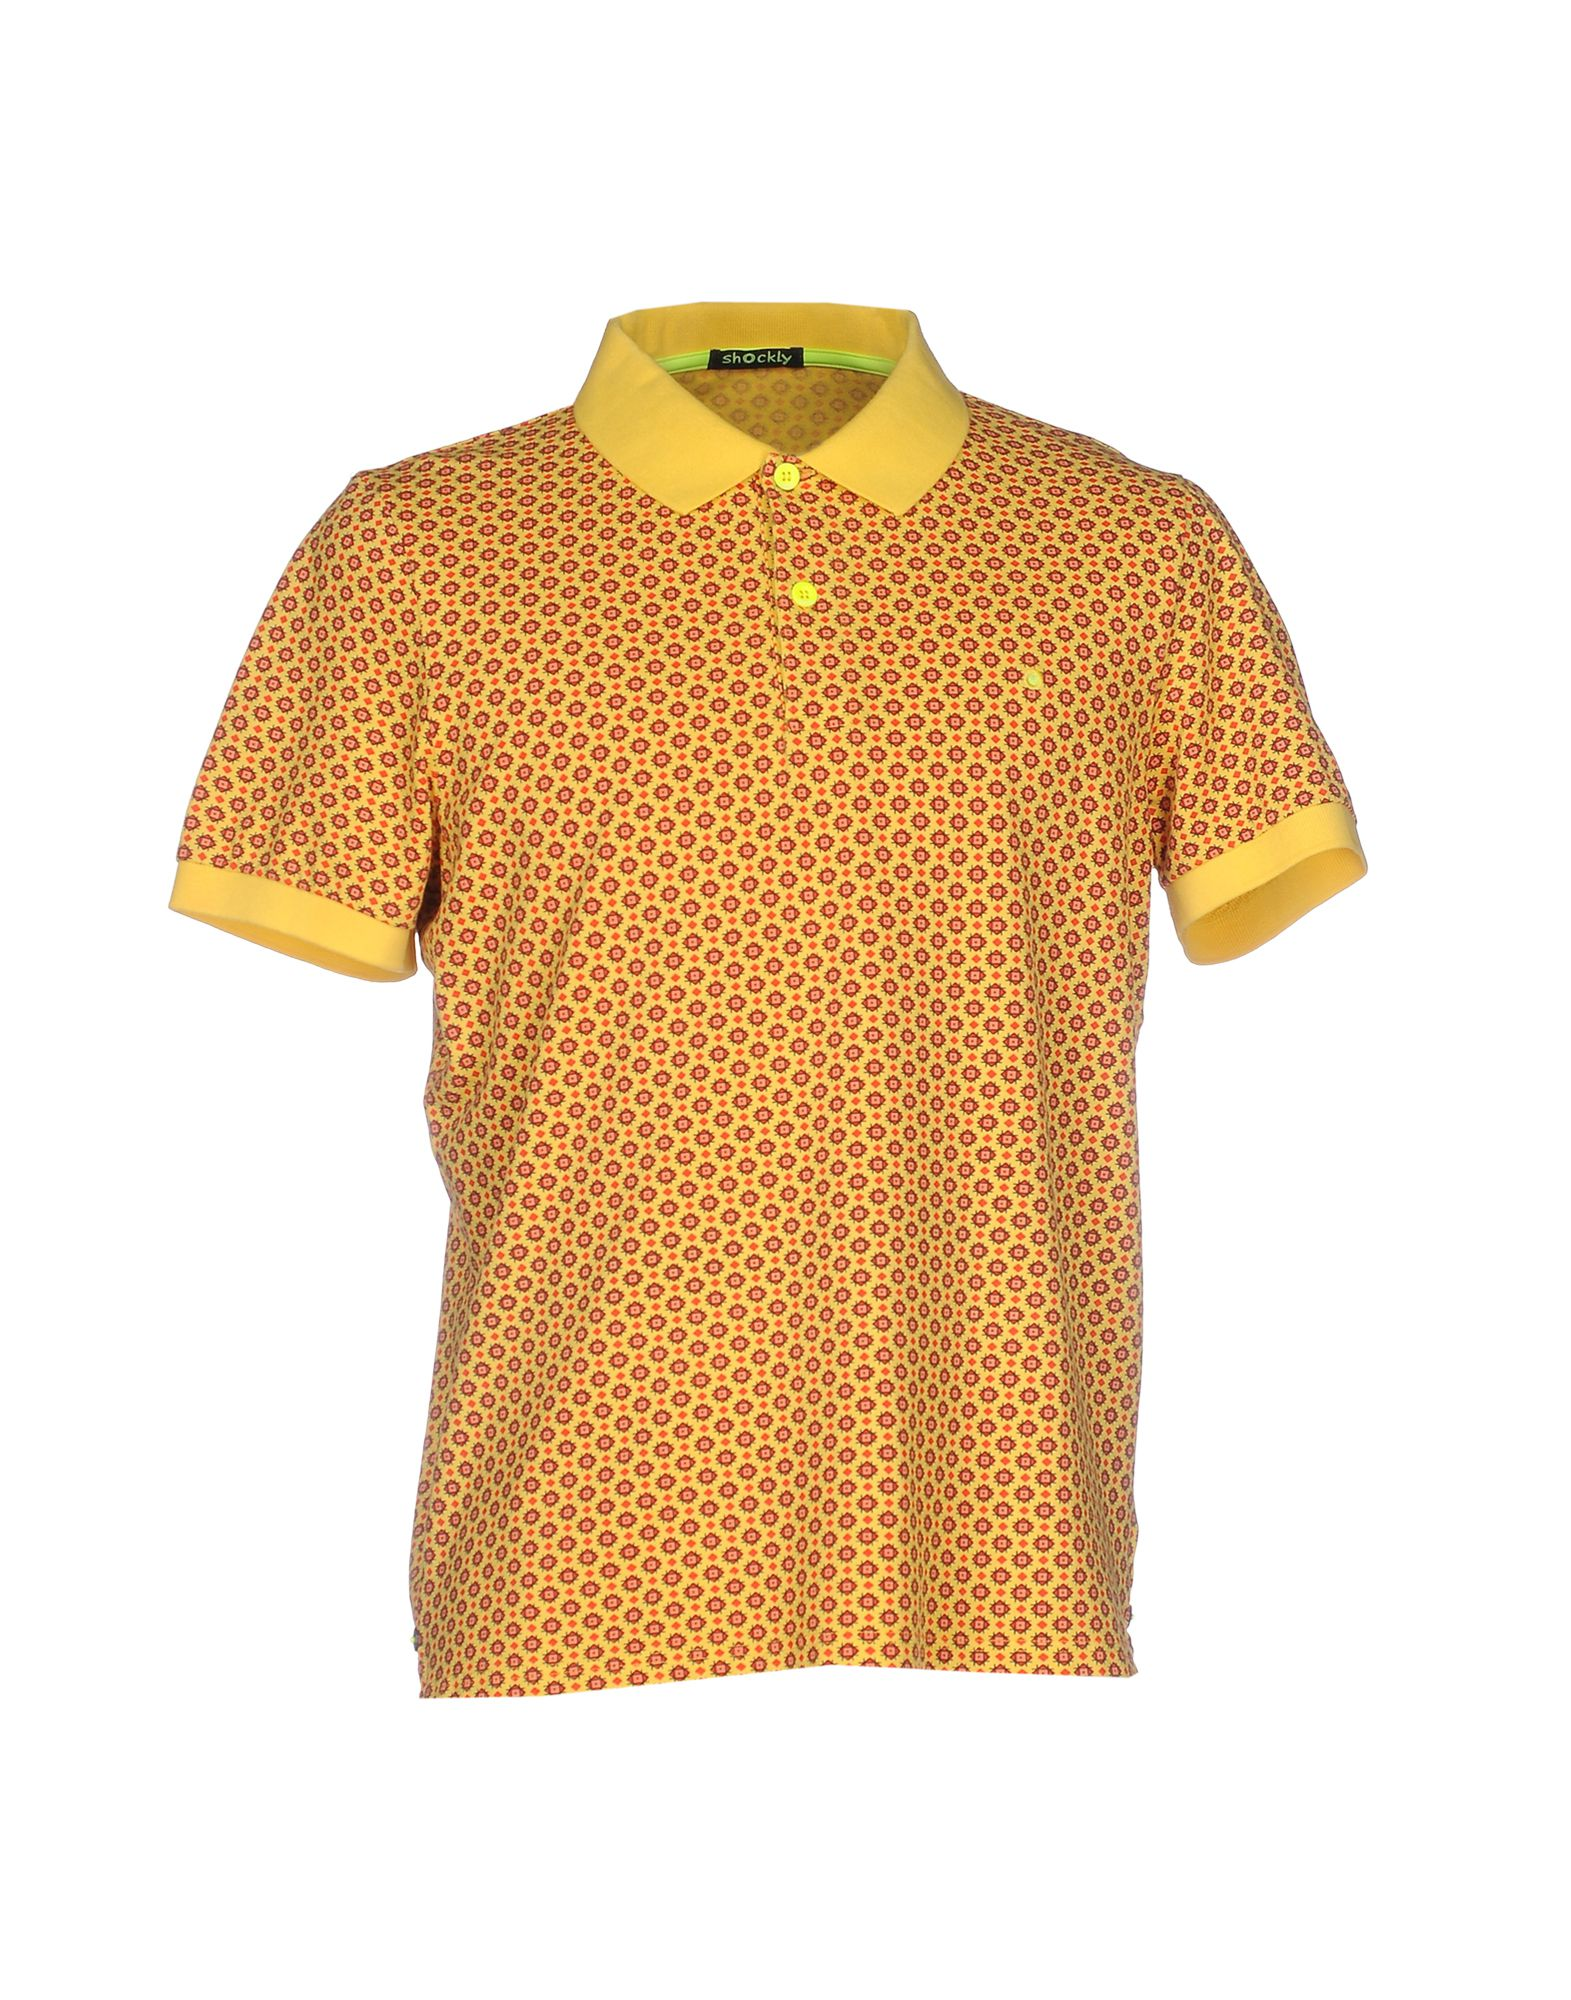 SHOCKLY Polo shirts